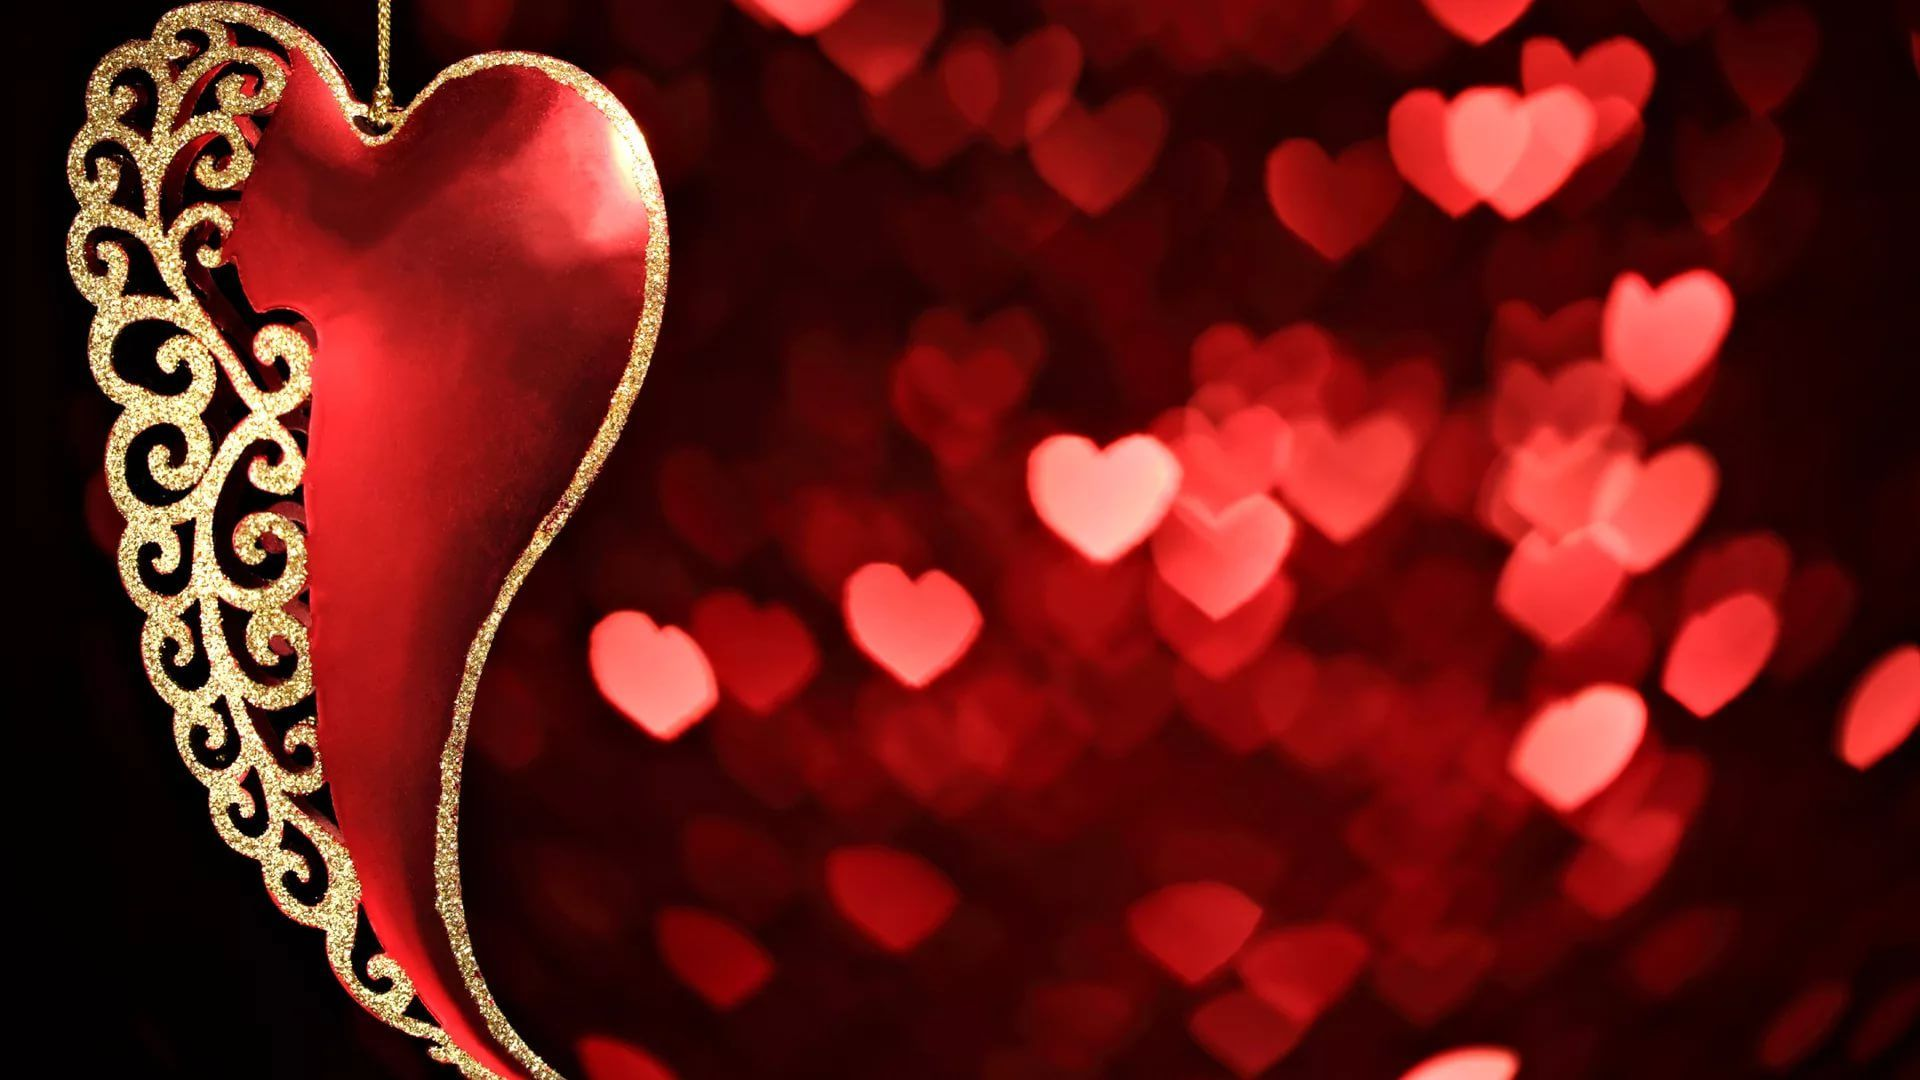 Heart wallpaper pc